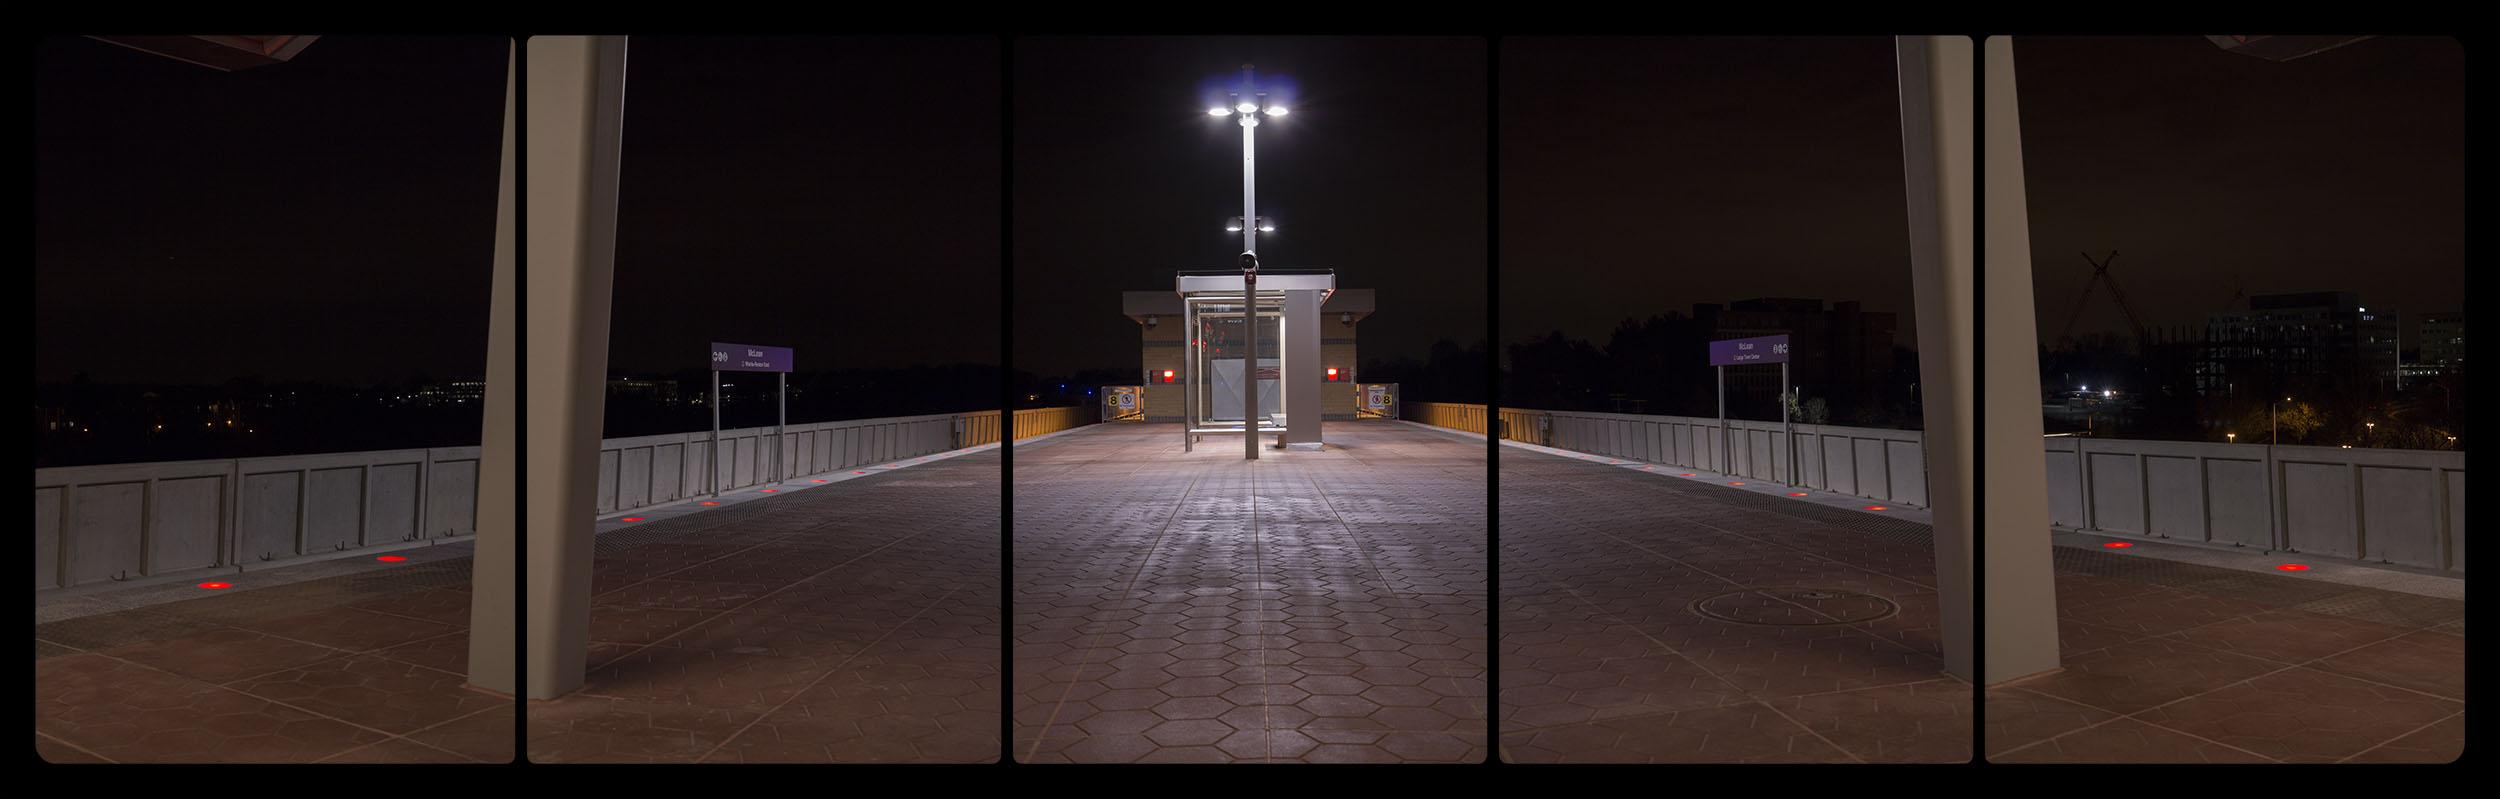 Metro Rail, McLean,11-29-2014,4254-4258